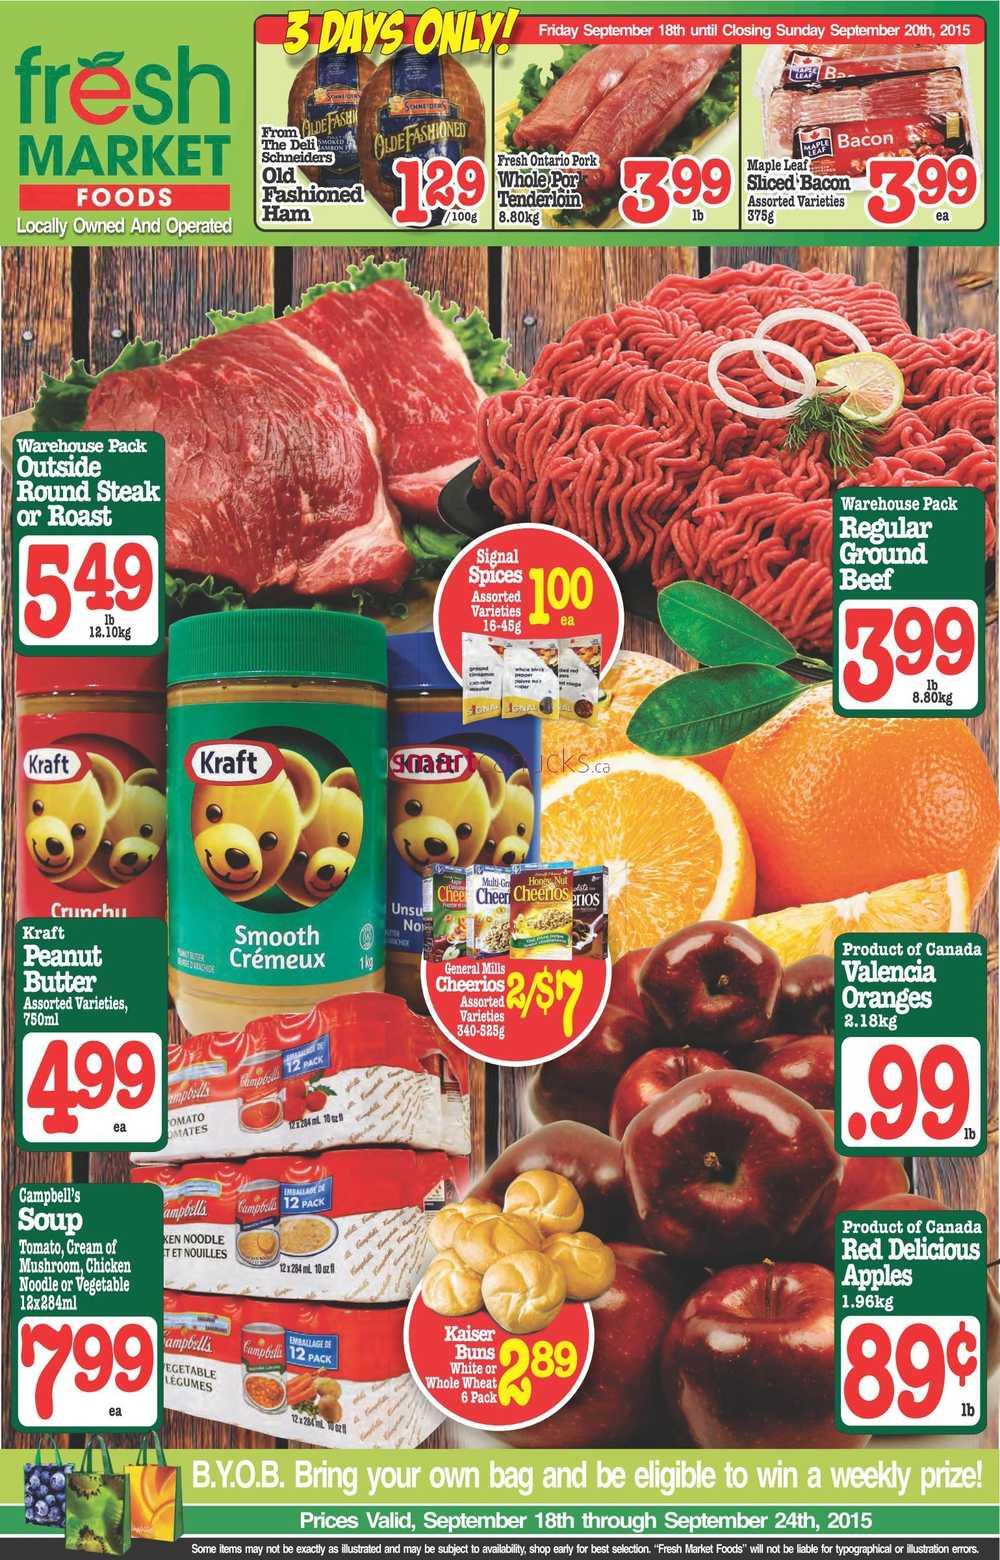 freshfoods supermarket Find fresh foods iga - castle hayne in castle hayne with address, phone number from yahoo us local includes fresh foods iga .